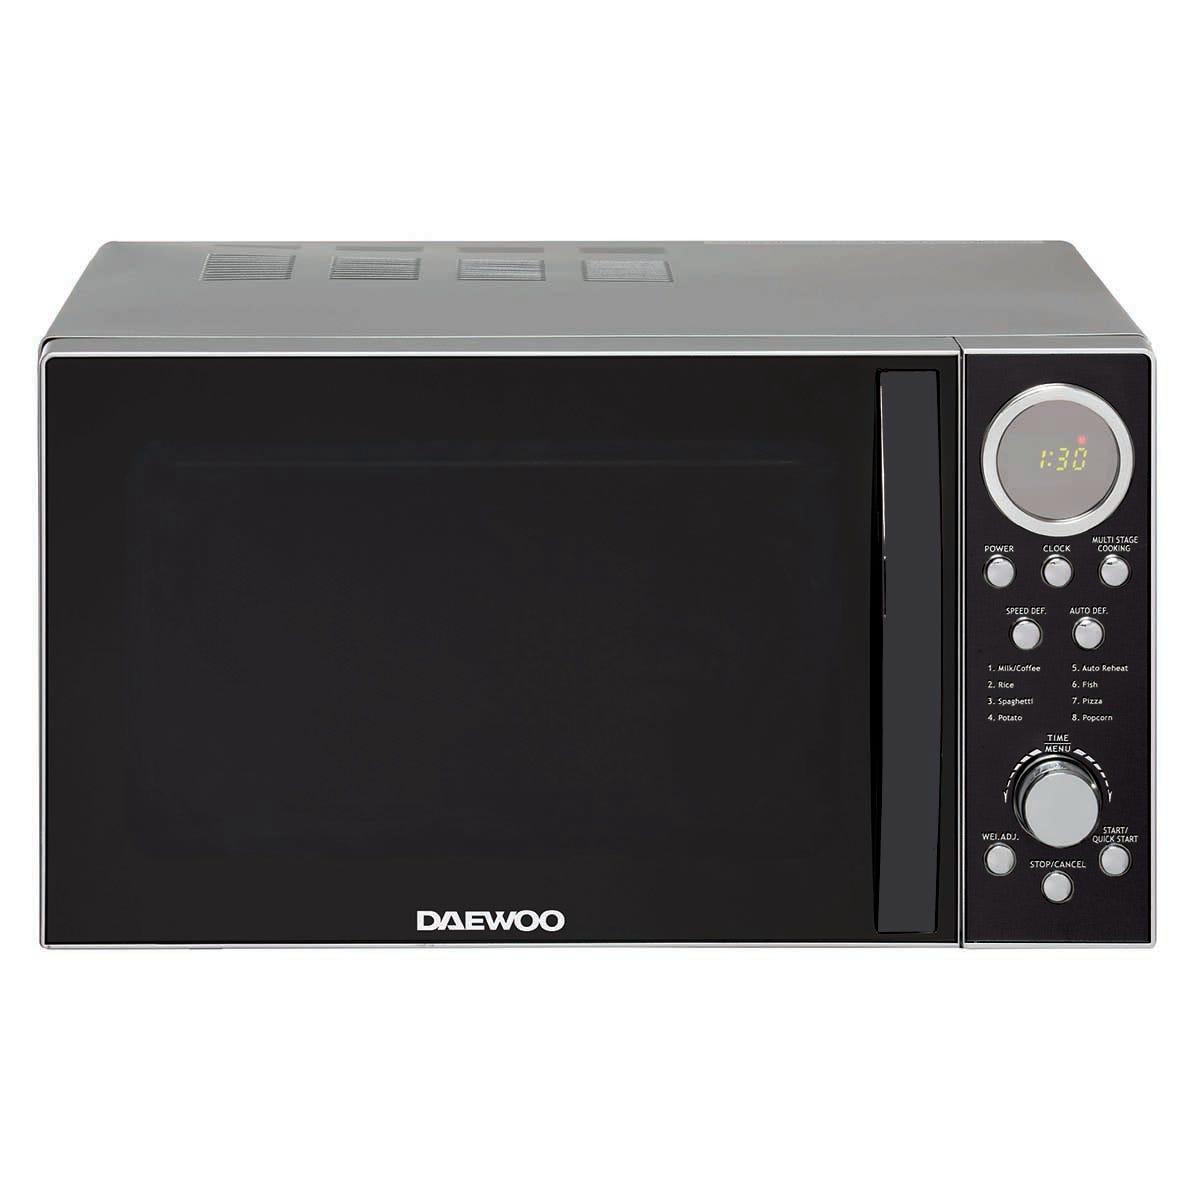 Daewoo SDA2087DS 20L 700W Microwave - Stainless Steel